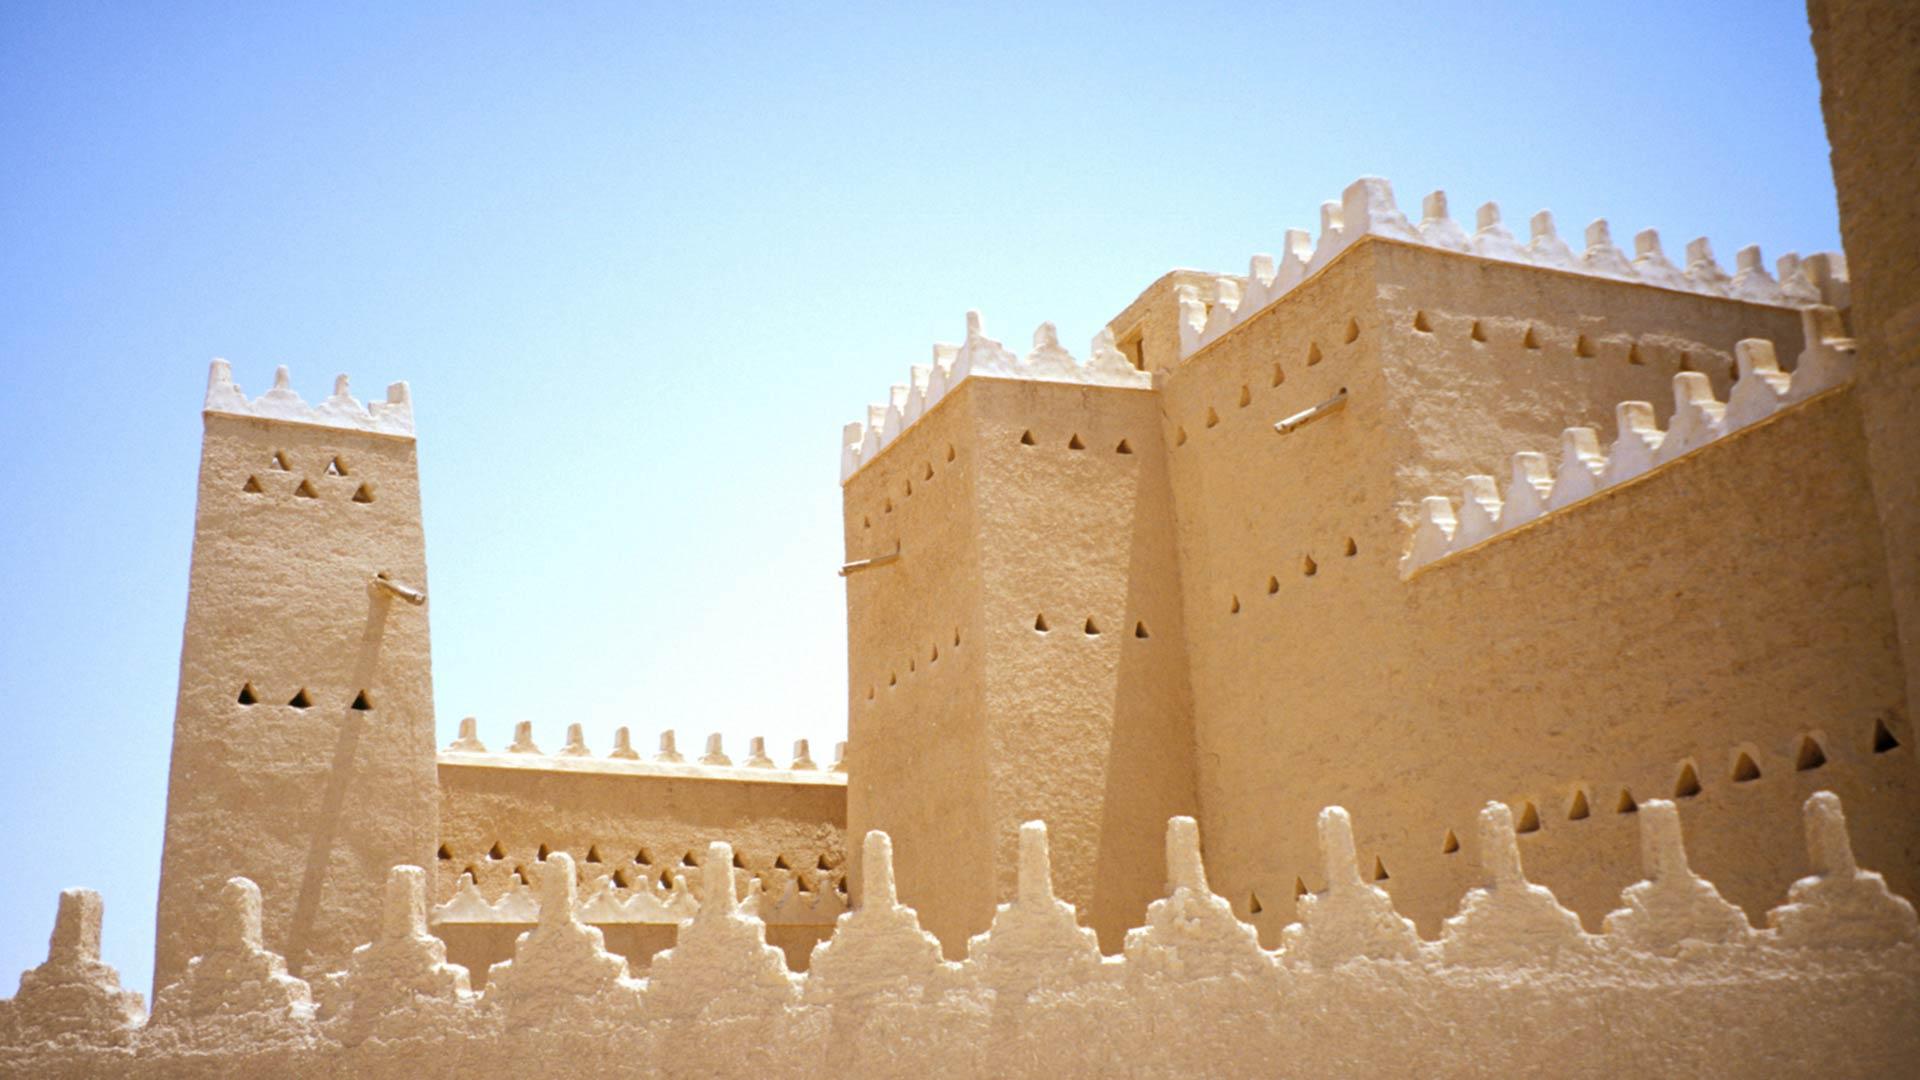 Architectural details of Palace of Saad Bin Saud, Saudi Arabia